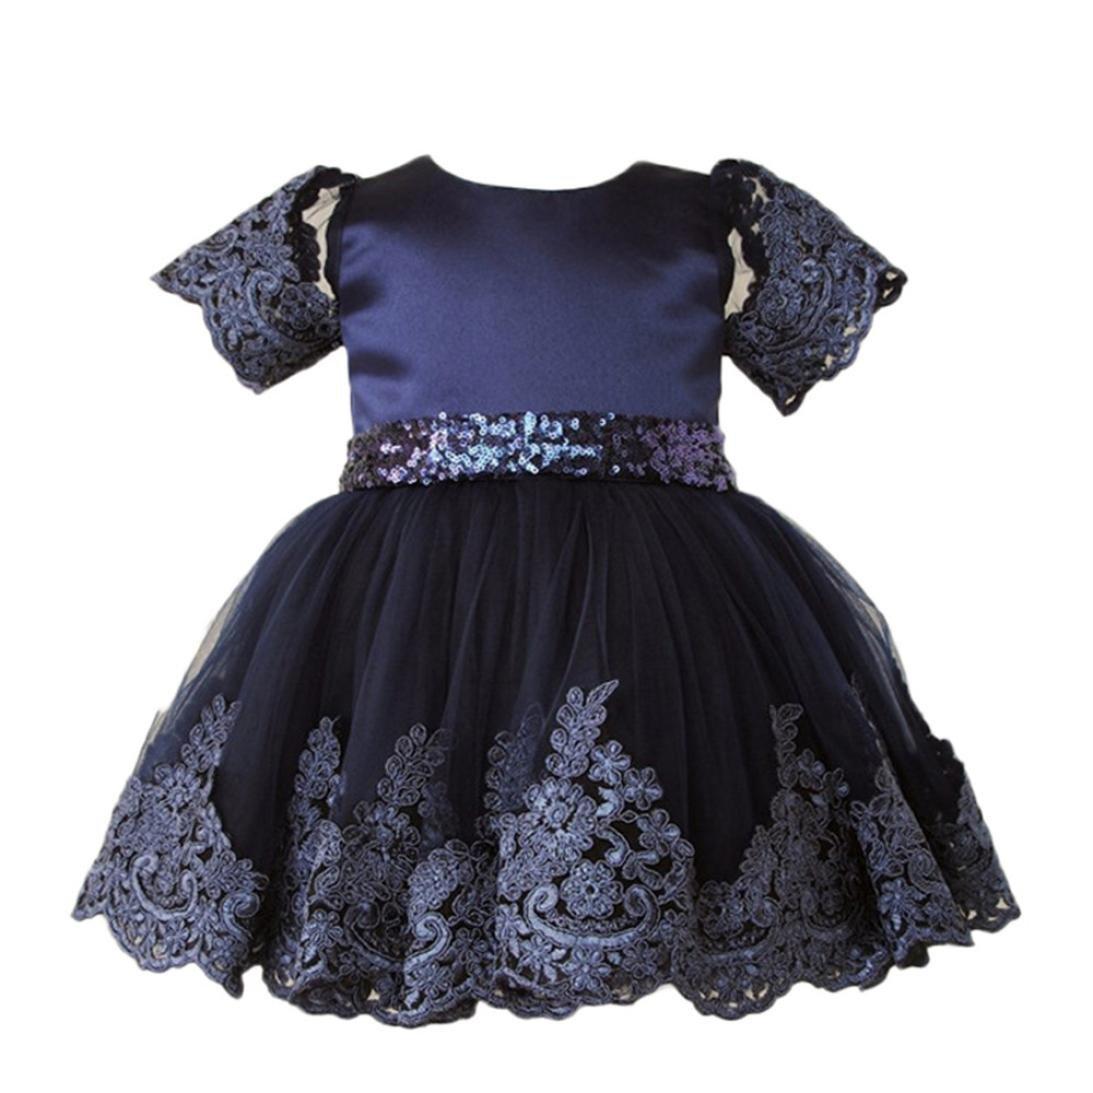 KONFA Teen Toddler Baby Girls Cartoon Striped Pocket Dress,Little Princess Long Sleeve Skirt Pullover Clothes Set